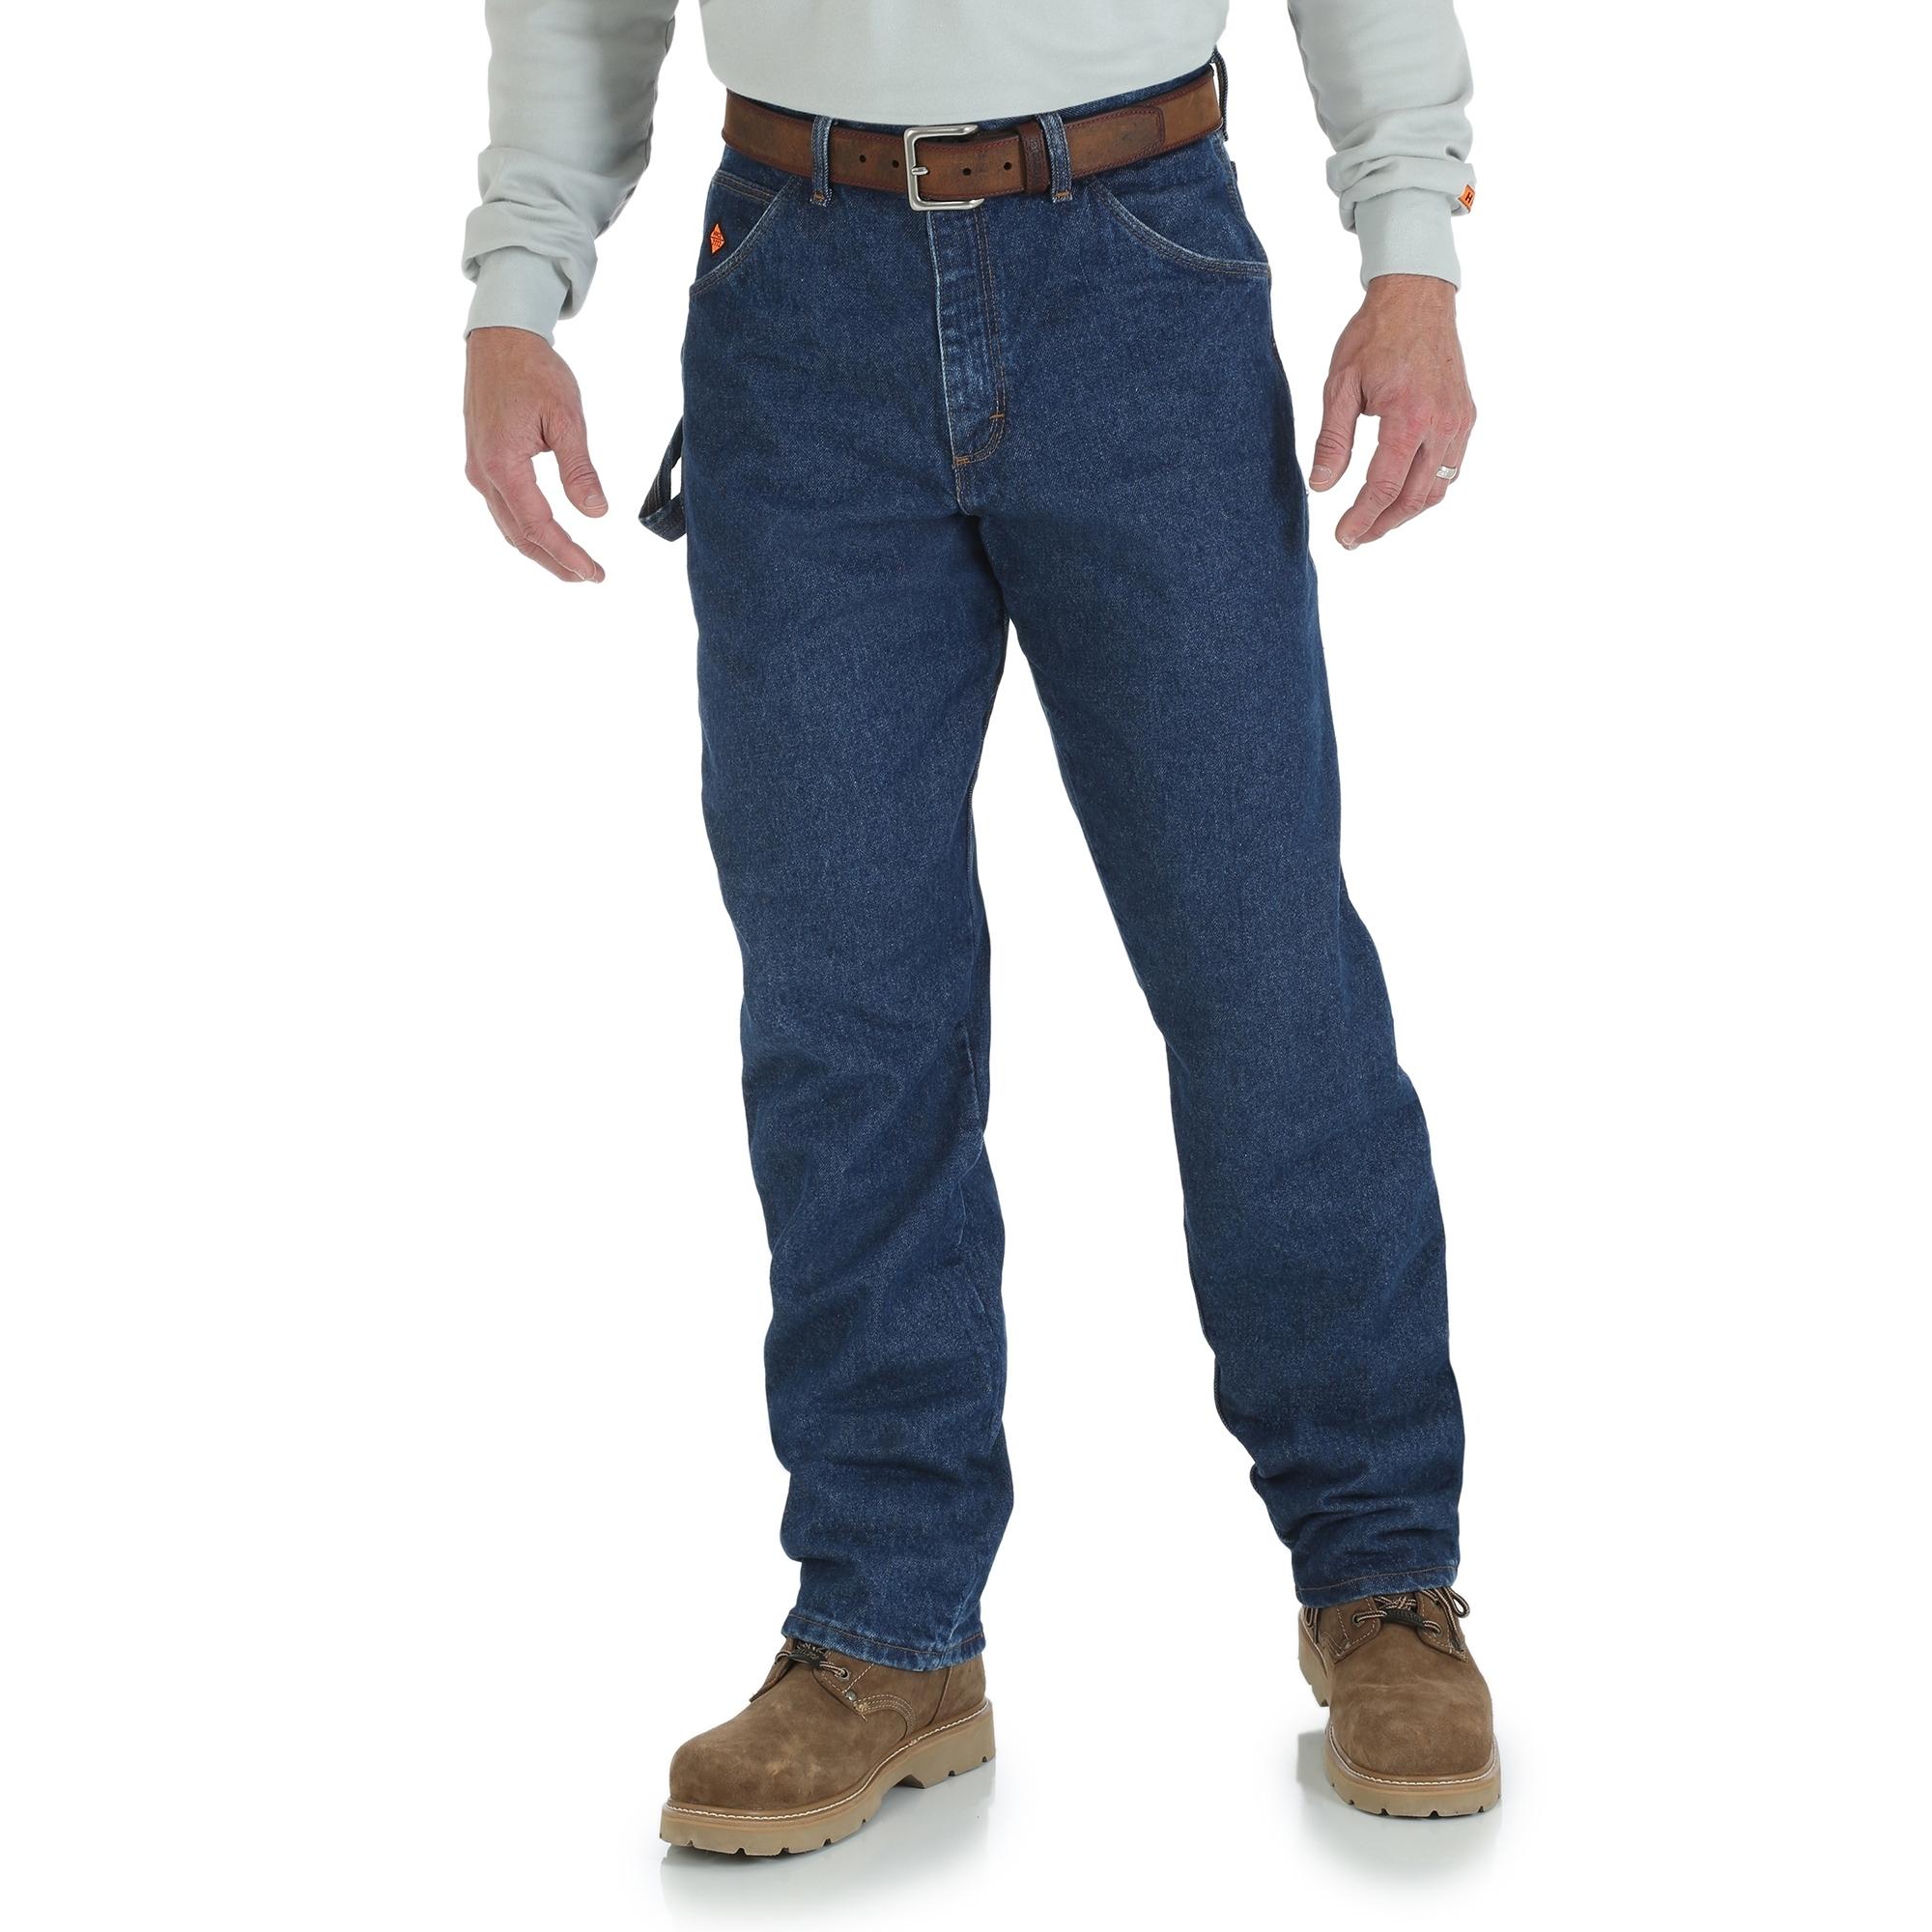 Mens Jeans 42 X 30